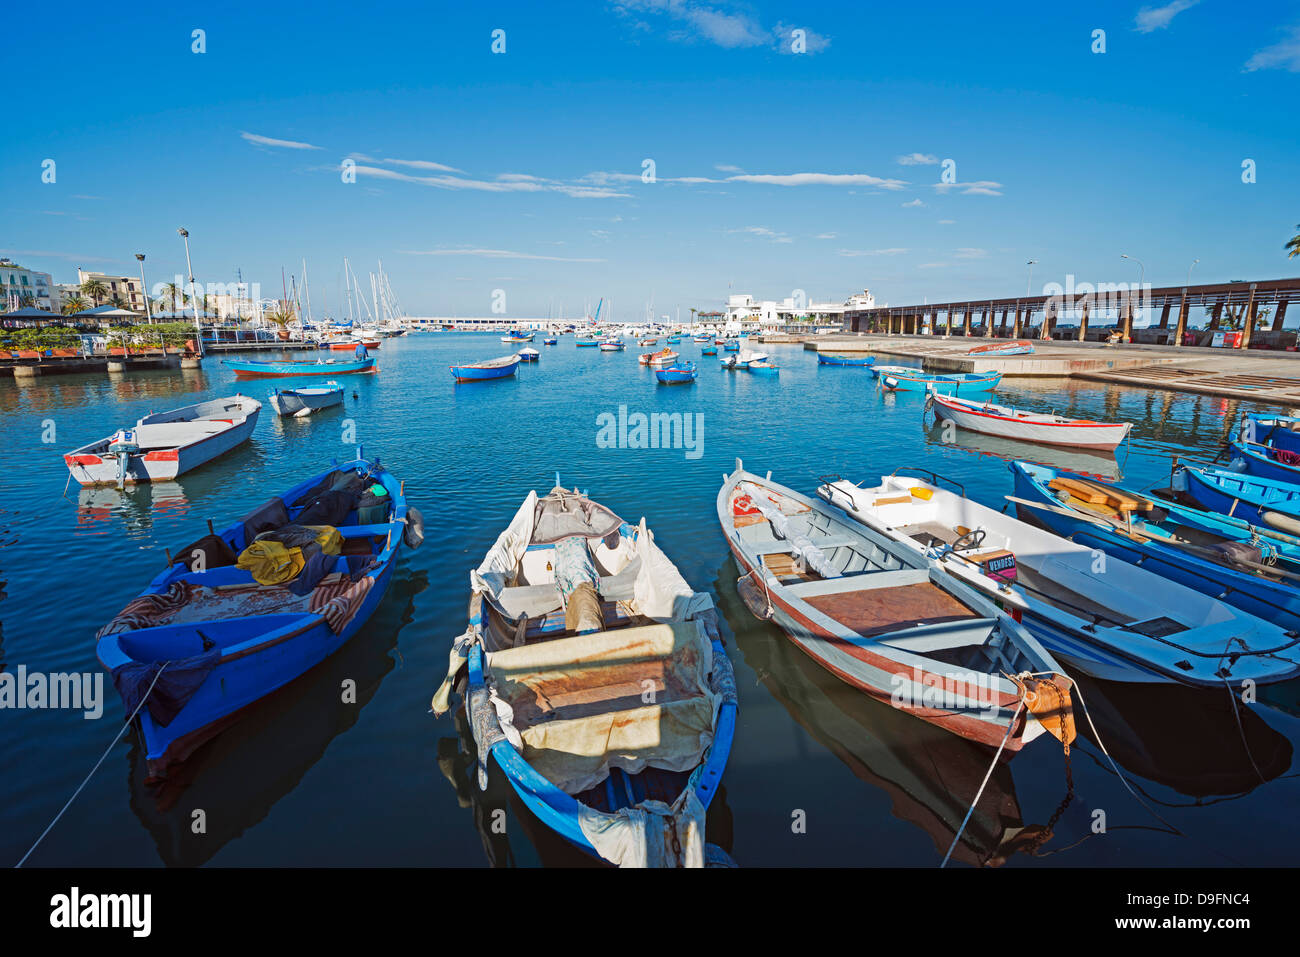 Harbour Front, Bari, Pouilles, Italie Photo Stock